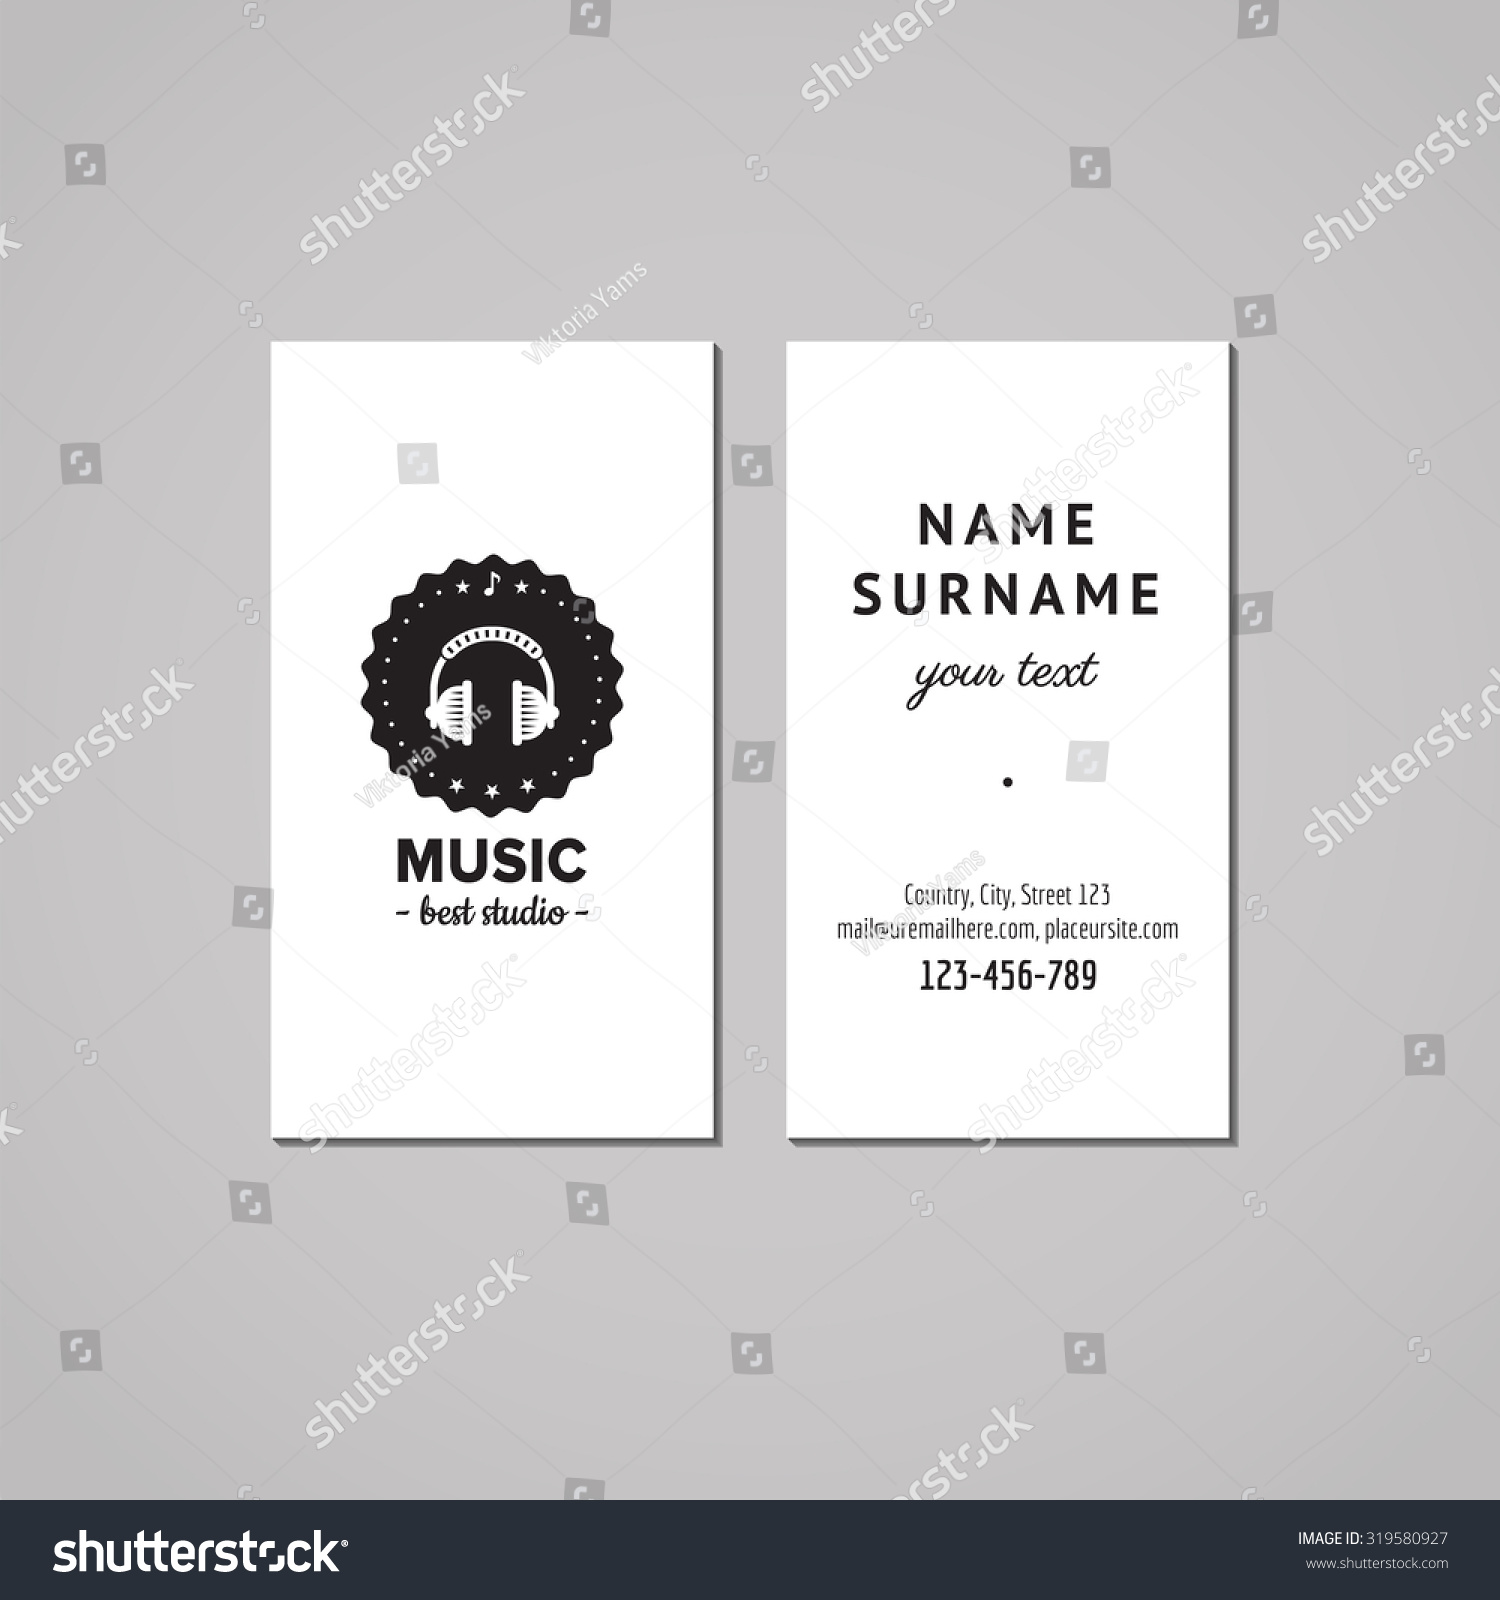 Music studio business card design concept logo badge with for Music business card design